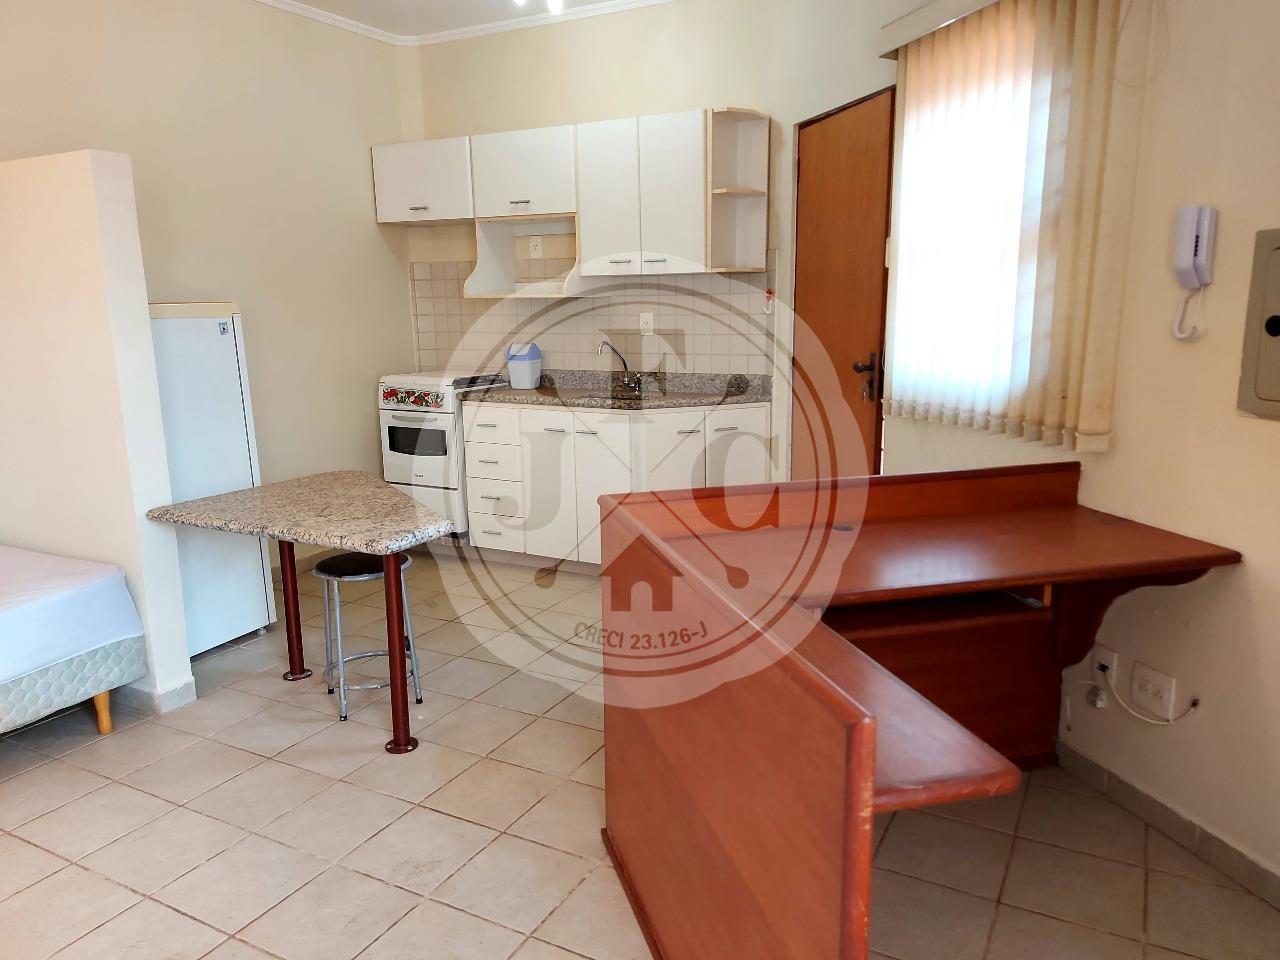 Kitnet para aluguel no Vila Amélia: Living